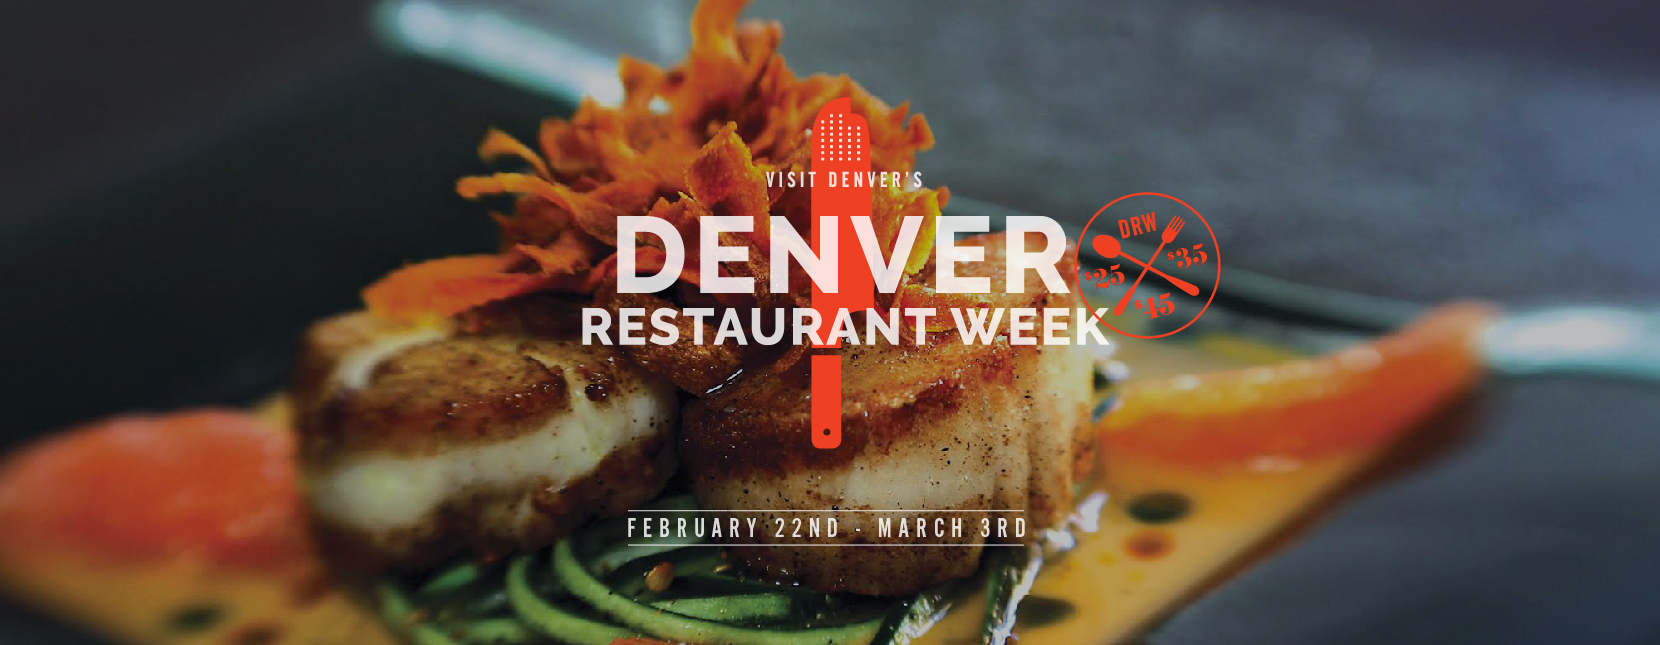 Chicago Restaurant Week 2020 Best Deals Denver Restaurant Week 2019 | VISIT DENVER